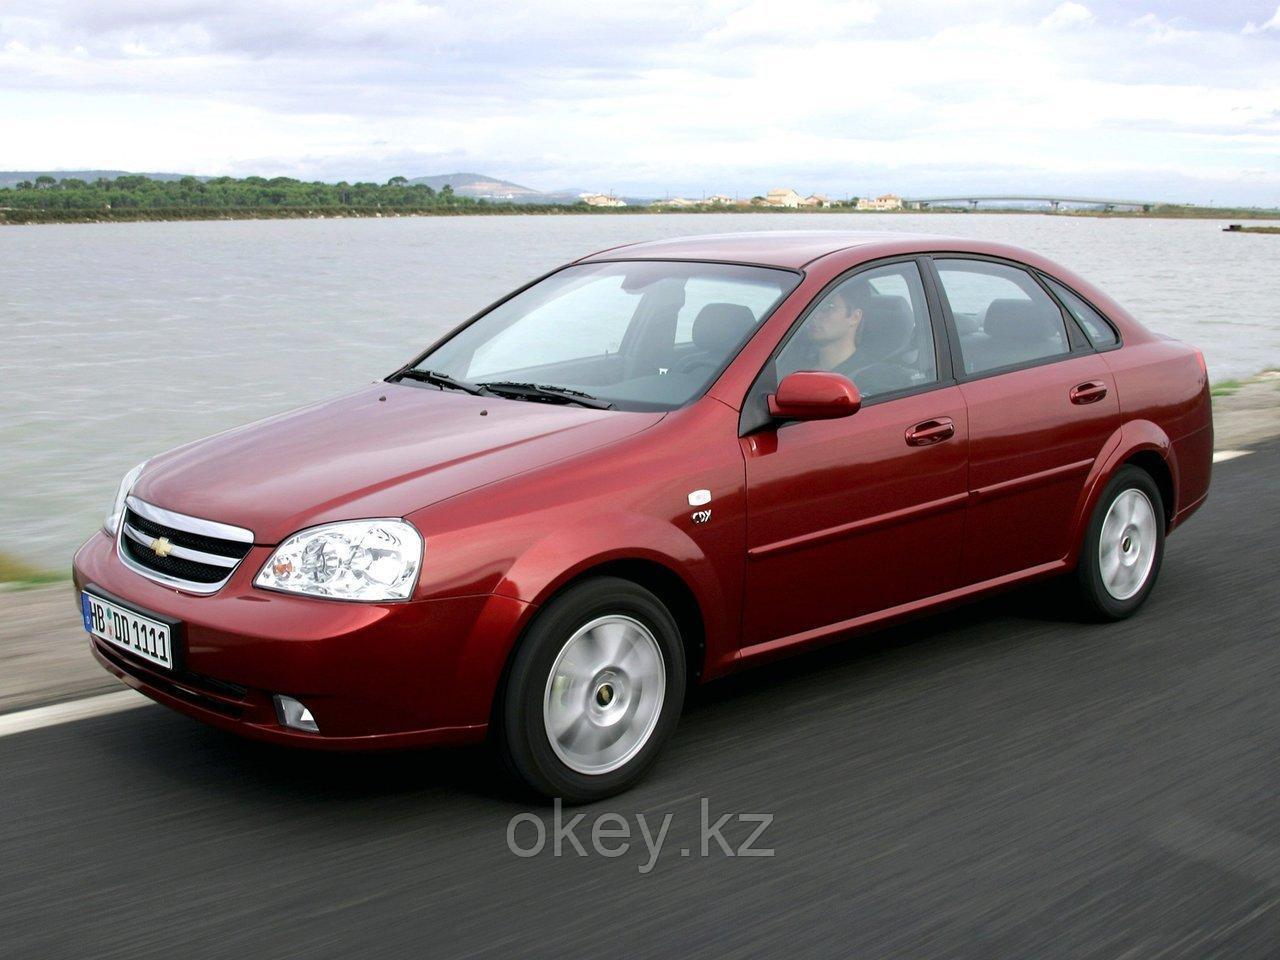 Тормозные колодки Kötl 3347KT для Chevrolet Lacetti седан (J200) 1.4, 2005-2013 года выпуска.